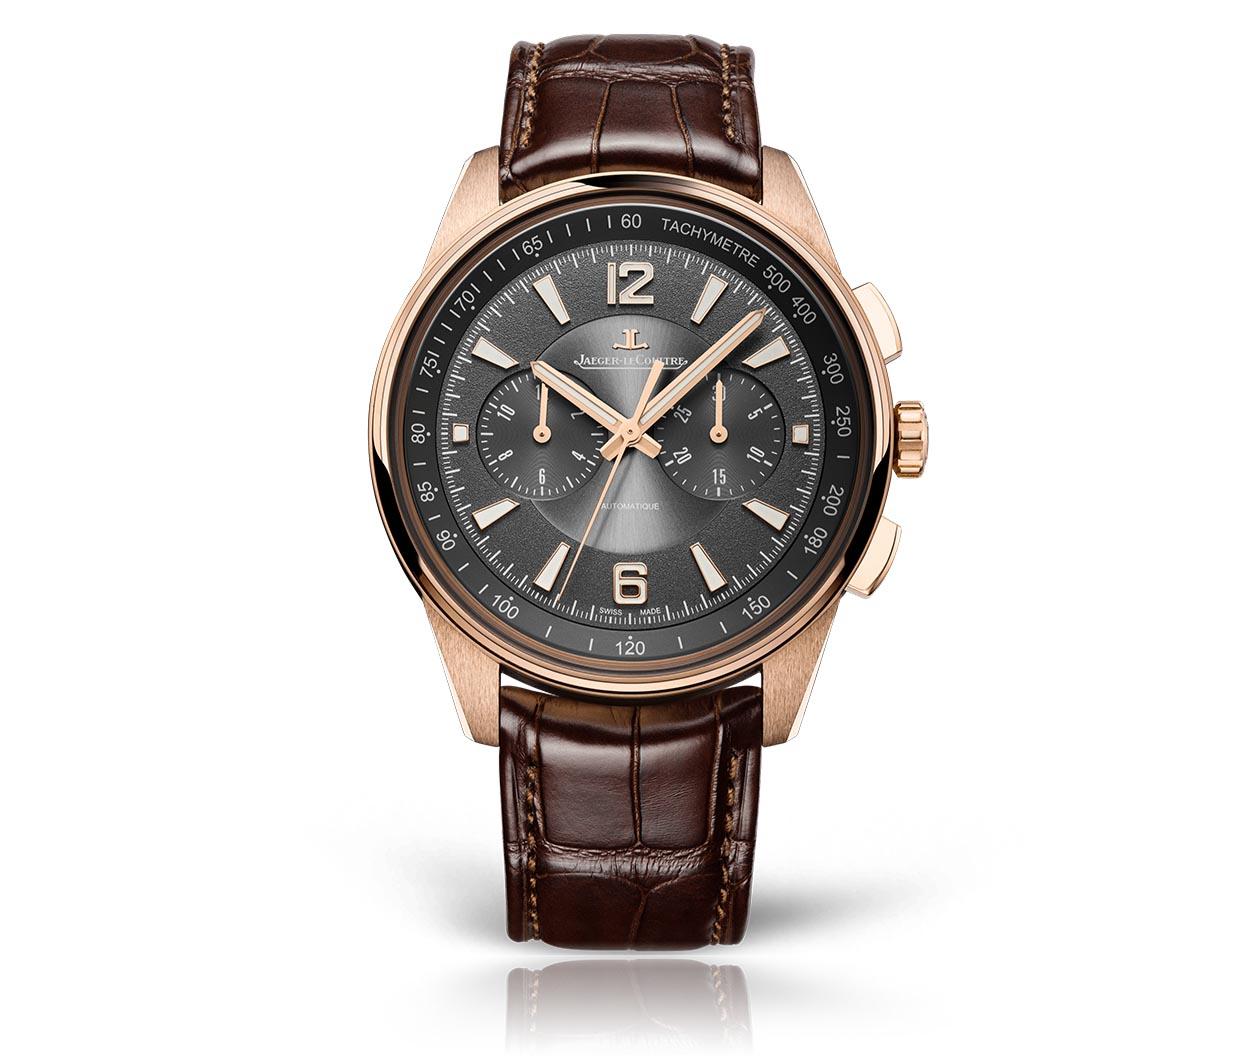 JaegerLeCoultre Polaris Chronograph 9022450 Flatlay FINAL